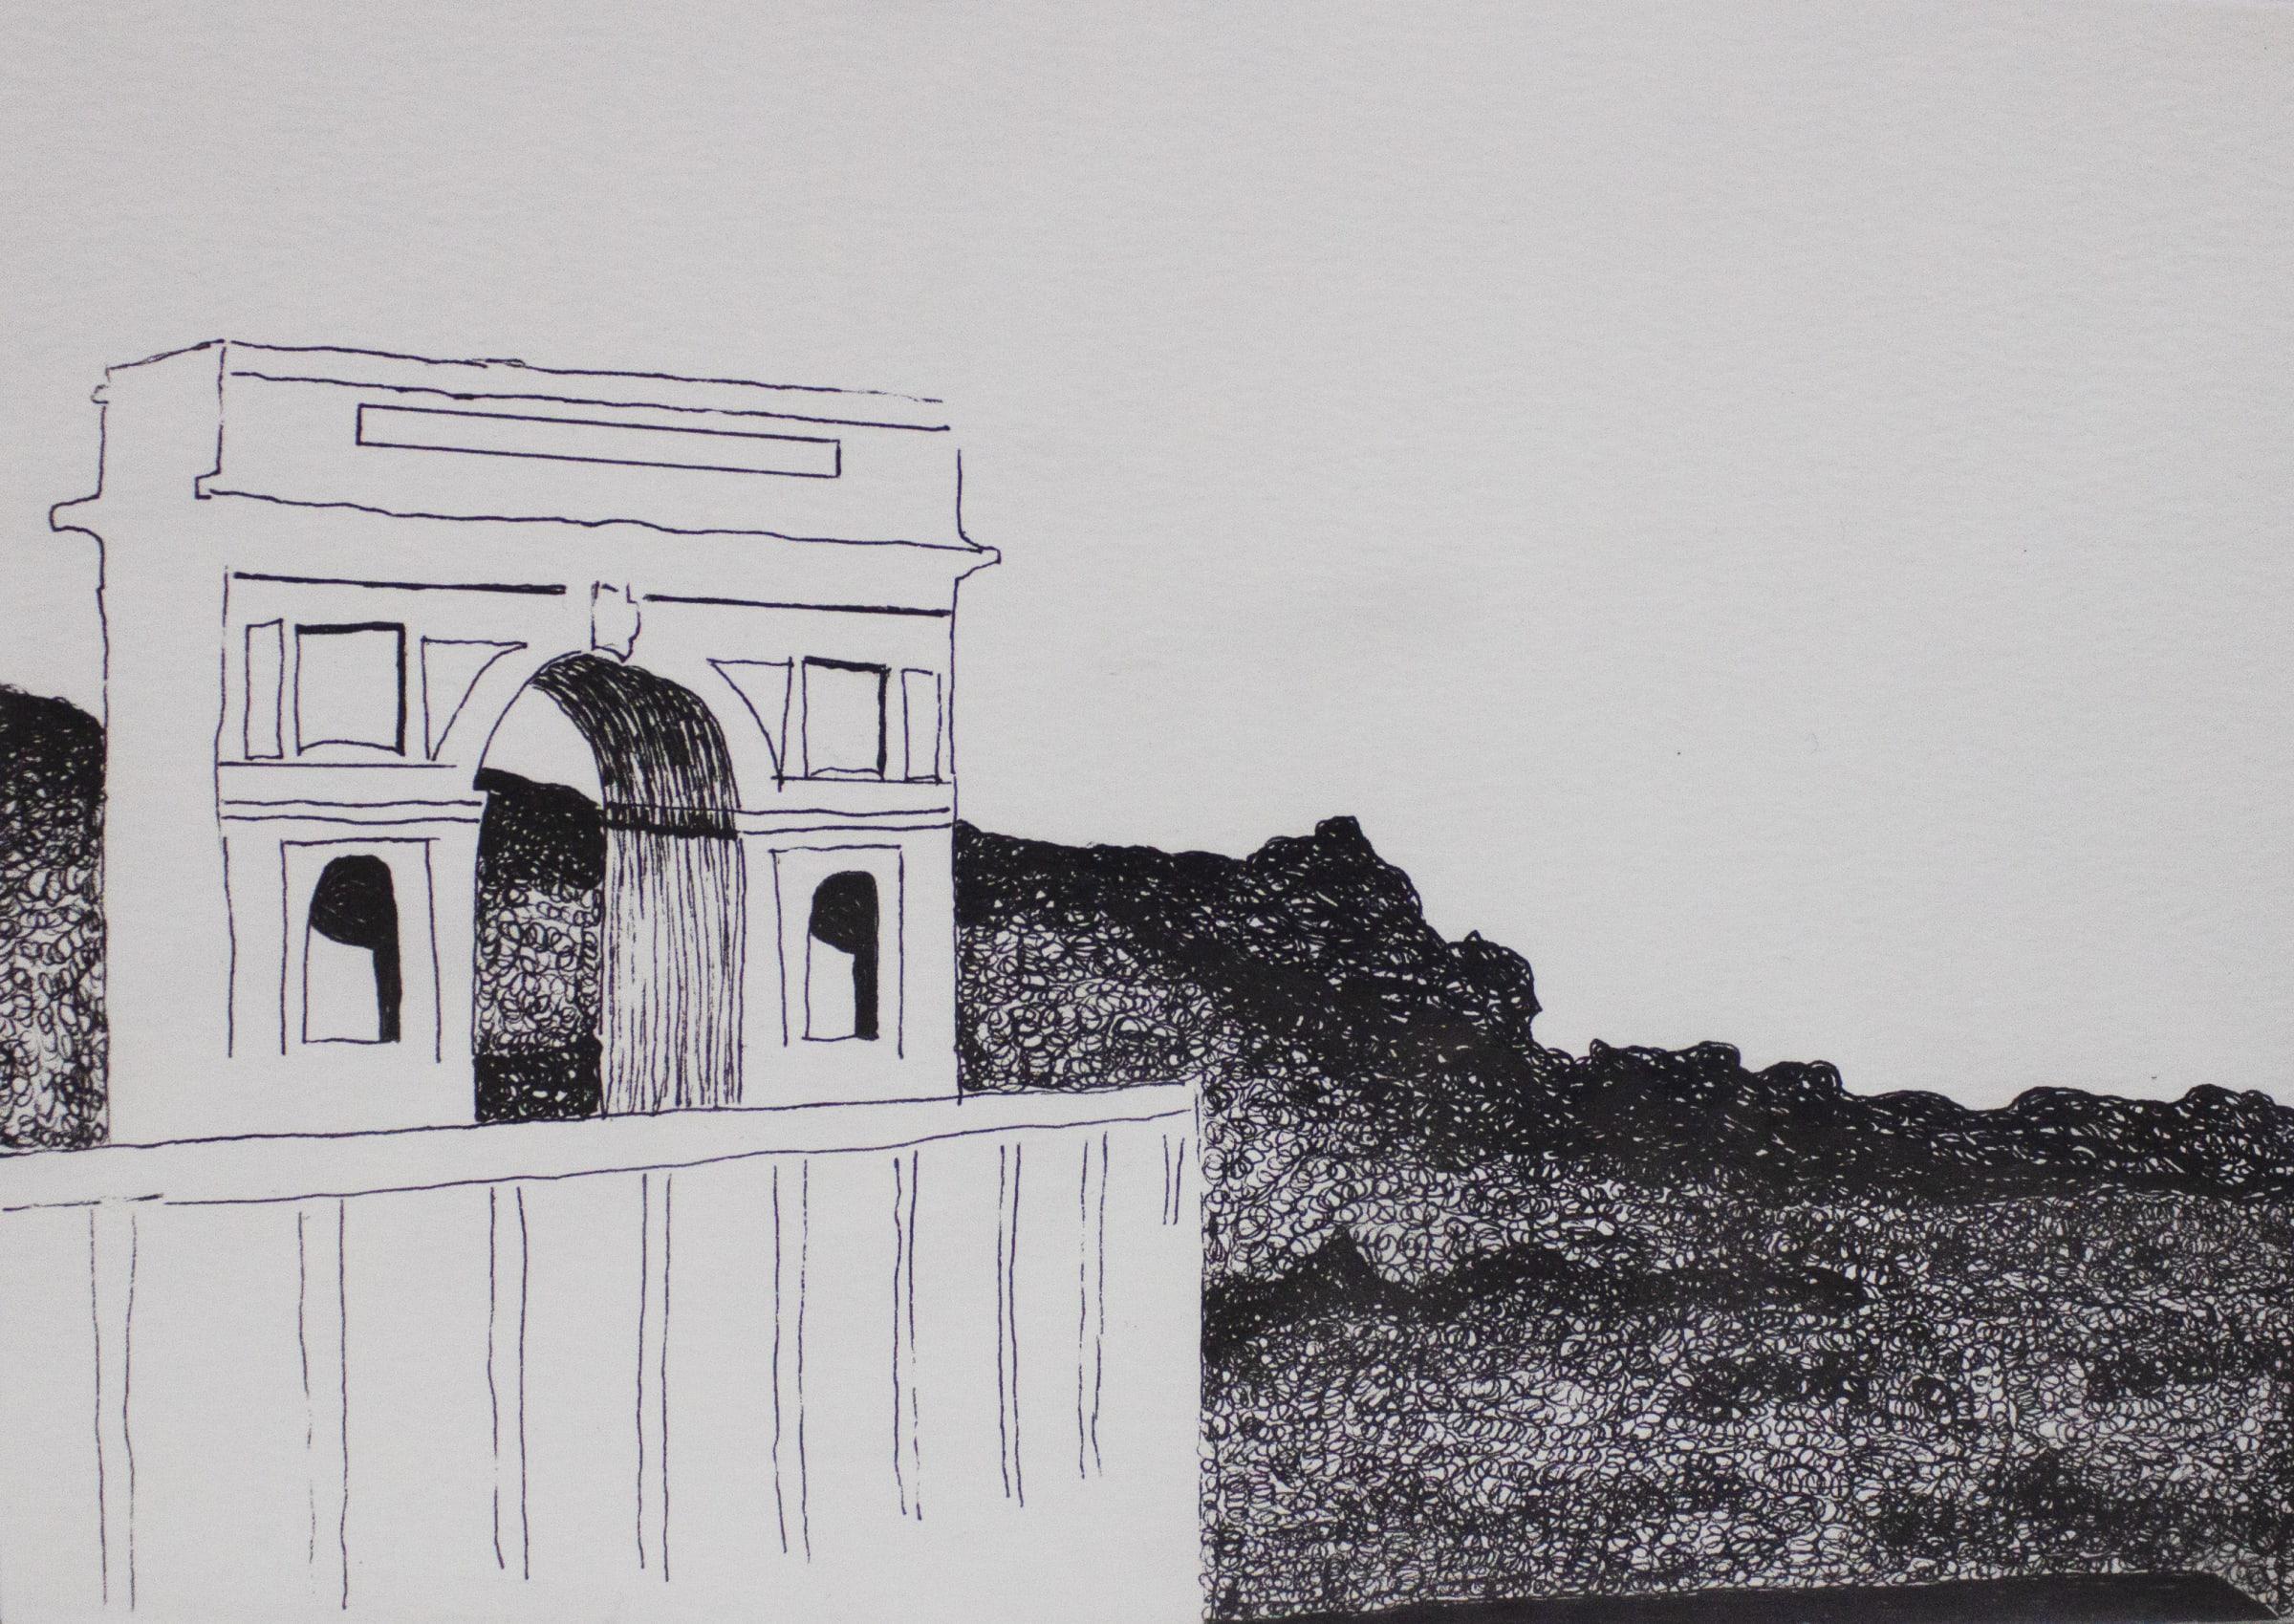 <span class=&#34;link fancybox-details-link&#34;><a href=&#34;/content/viewing-room/50/artworks2563/&#34;>View Detail Page</a></span><div class=&#34;medium&#34;>Ink On Watercolour Paper</div> <div class=&#34;dimensions&#34;>14.8cm x 21cm</div>